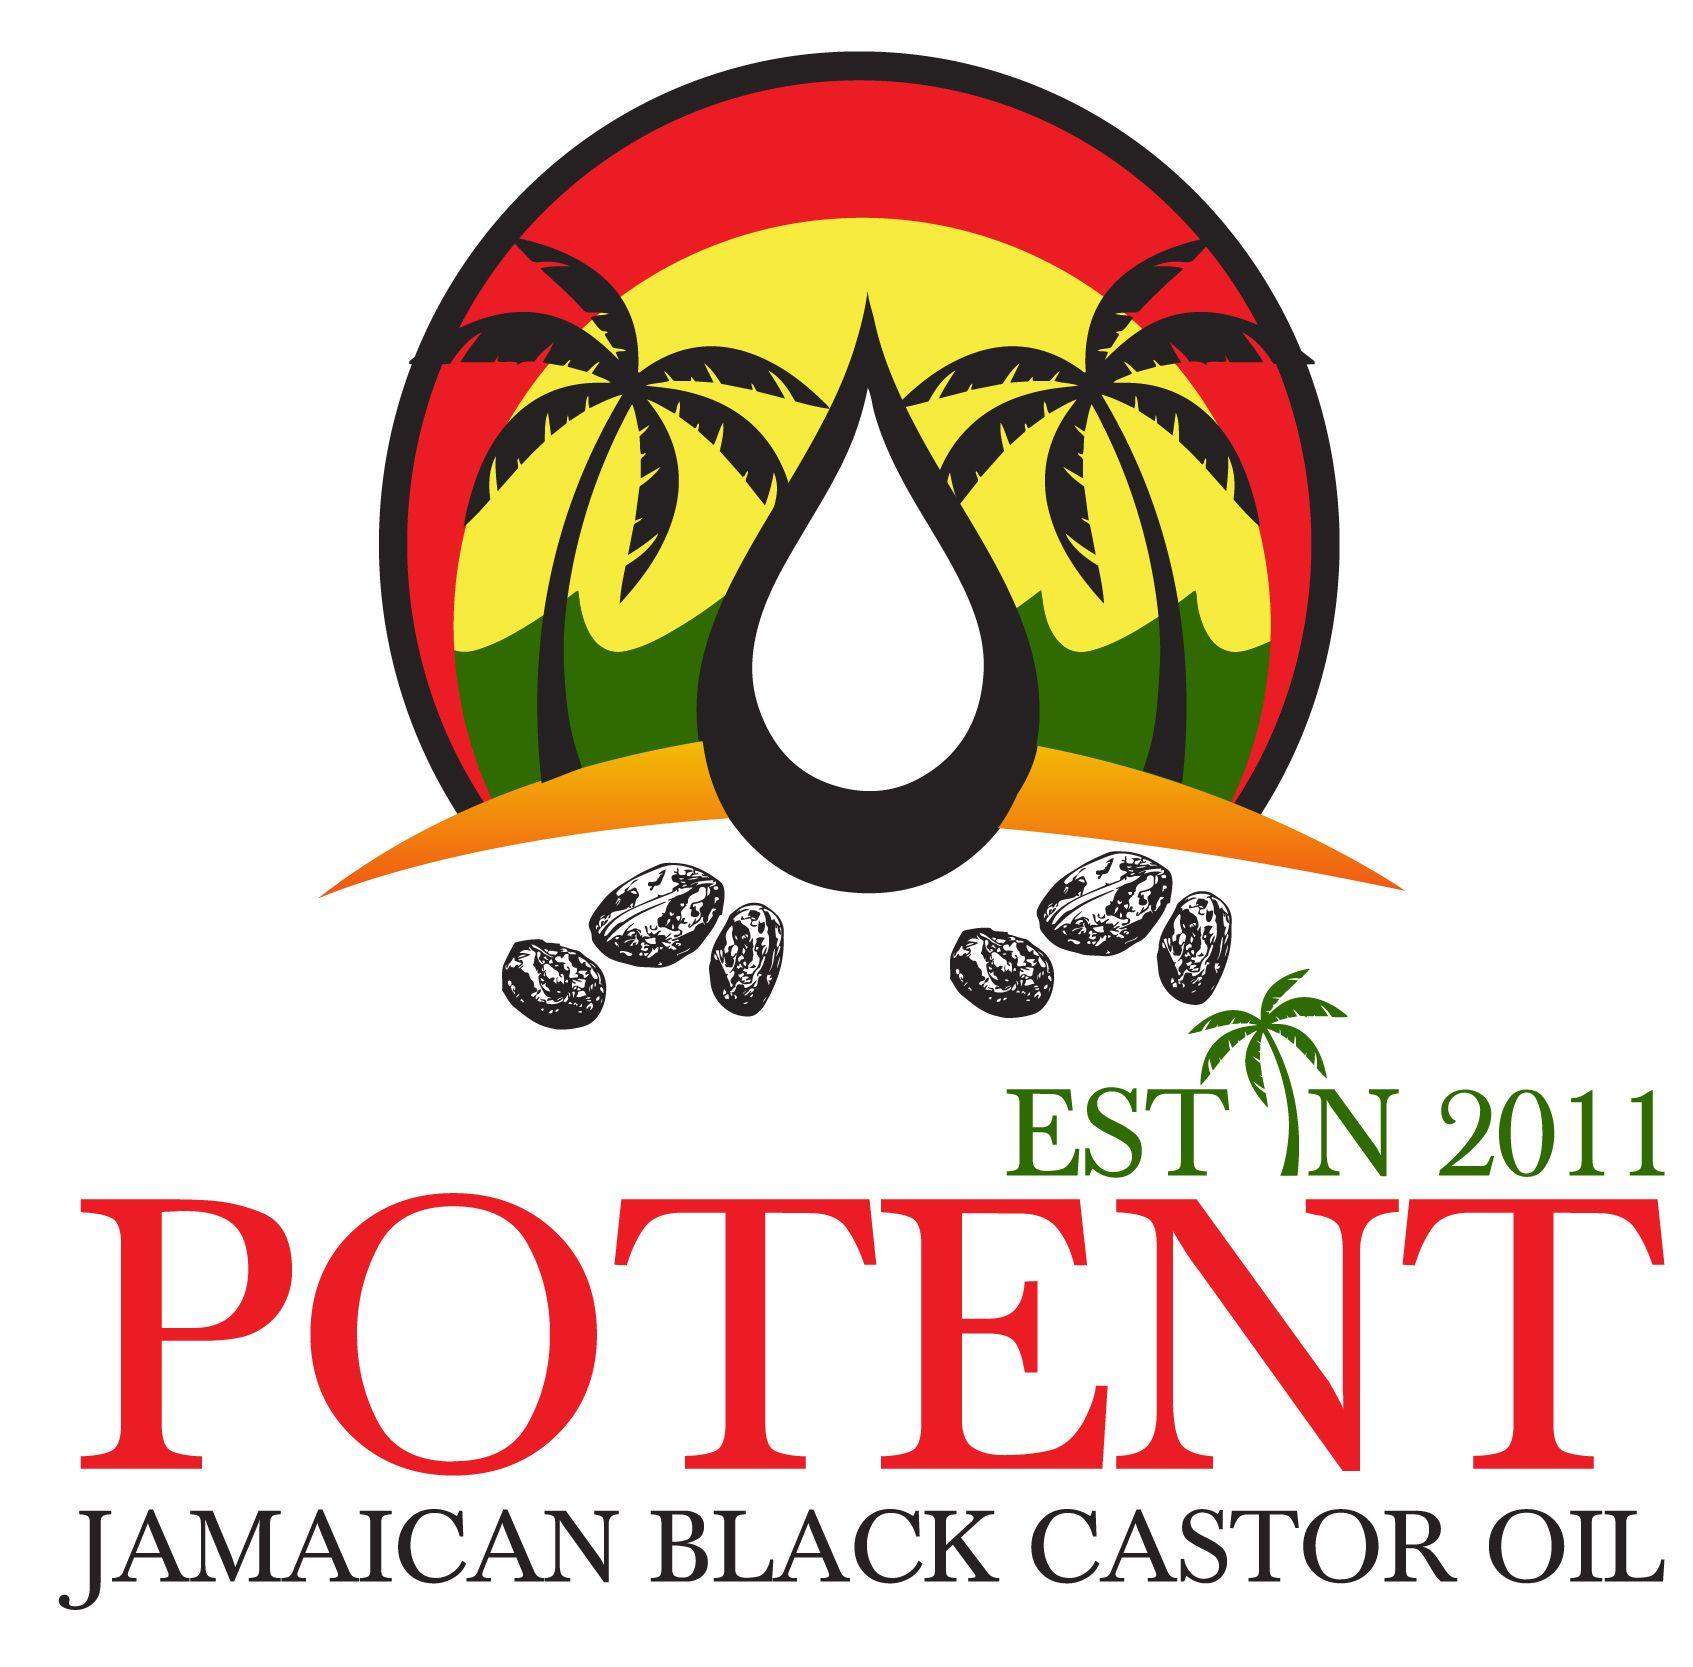 Bdi Brands Llc Announces The Rebranding Of Potent Jamaican Black